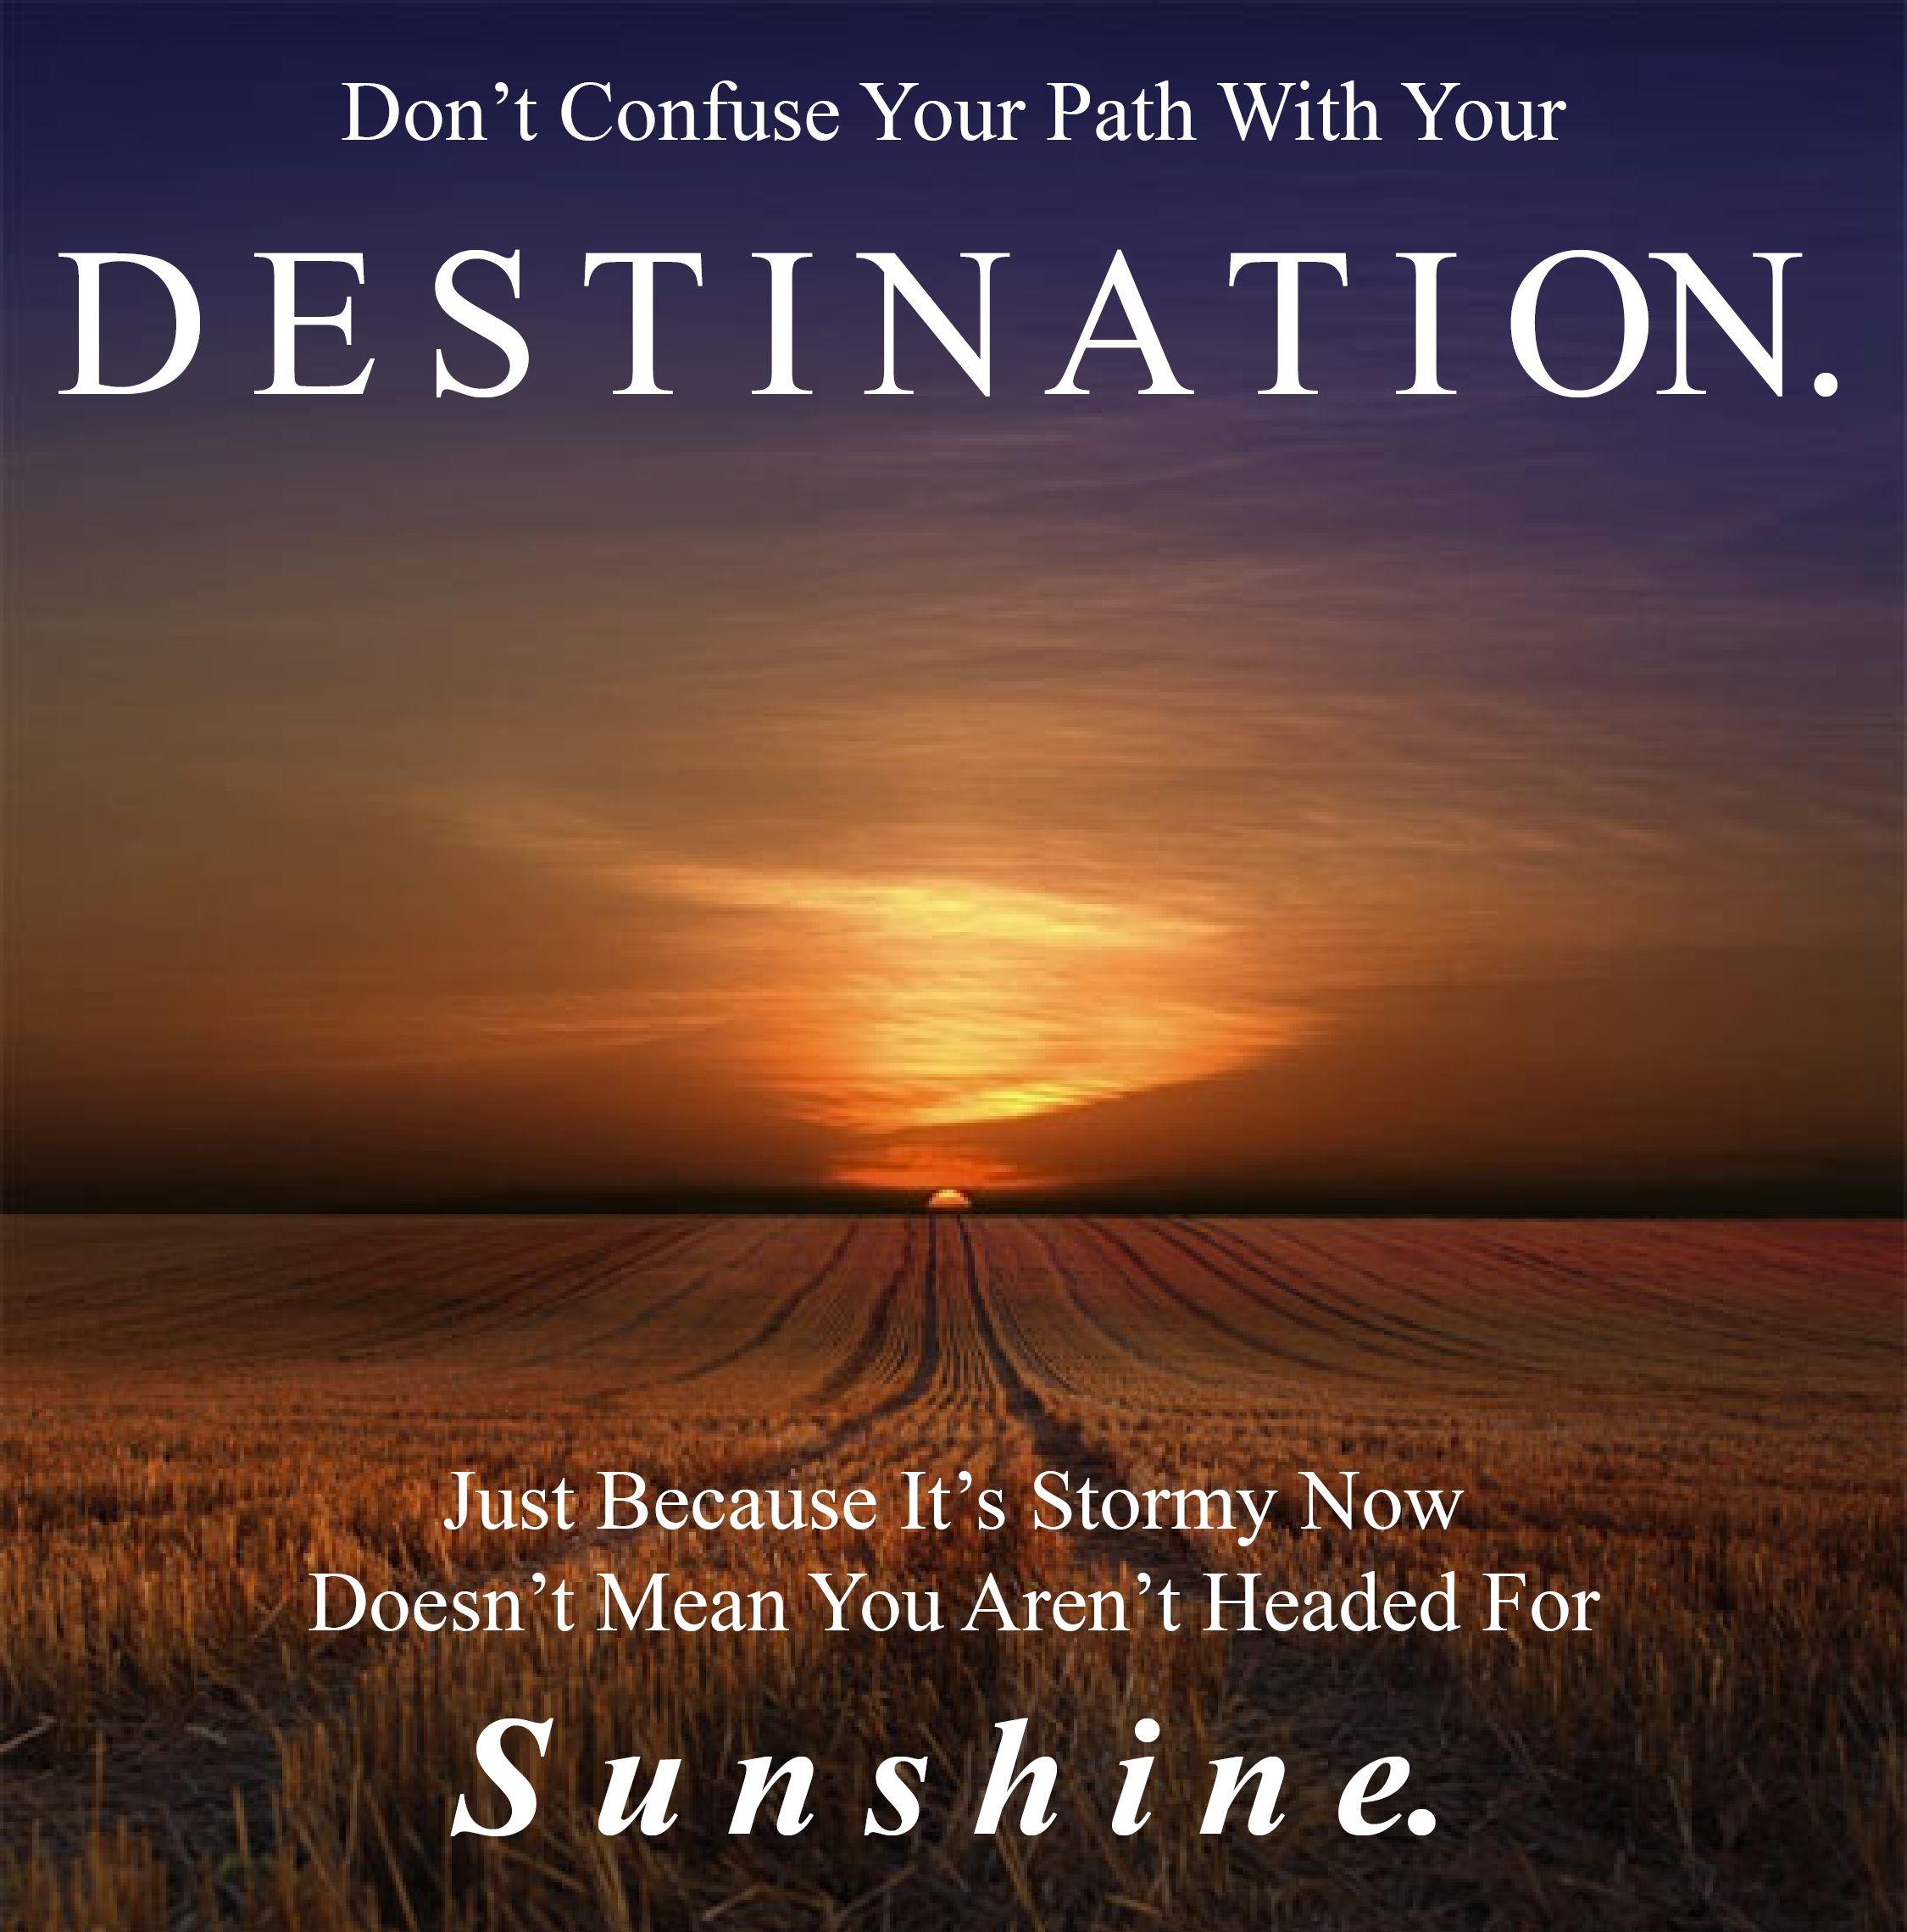 Inspirational Quotes On Perseverance: Inspiration Motivation Empowerment Encouragement